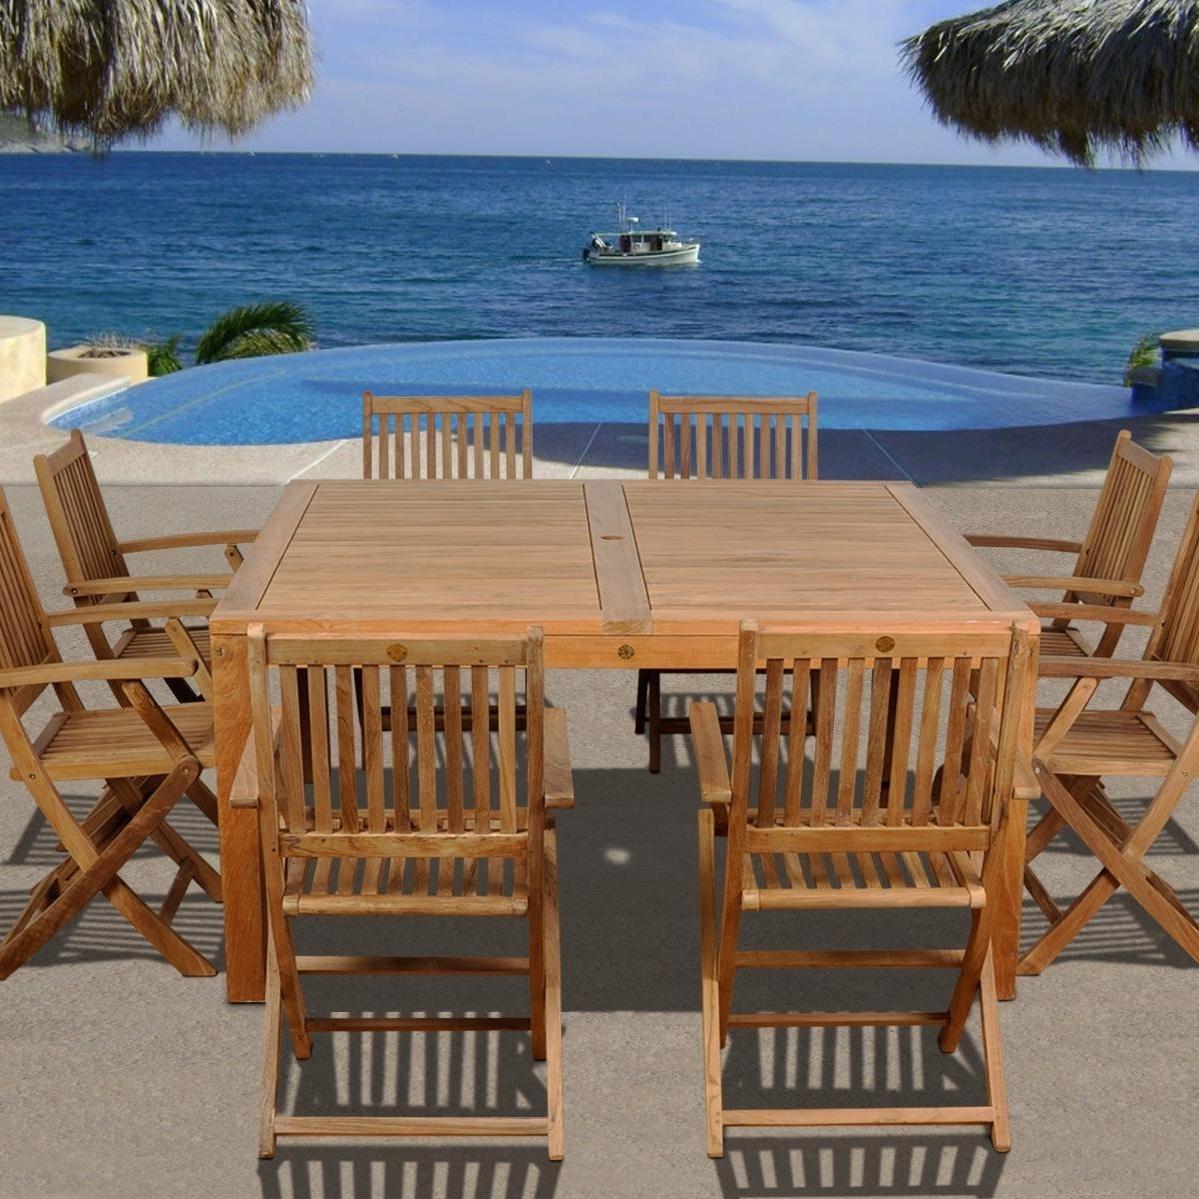 Teak Patio Conversation Sets Regarding Popular Amazonia Teak Dubai 8 Person Teak Patio Dining Set With Folding (View 12 of 20)